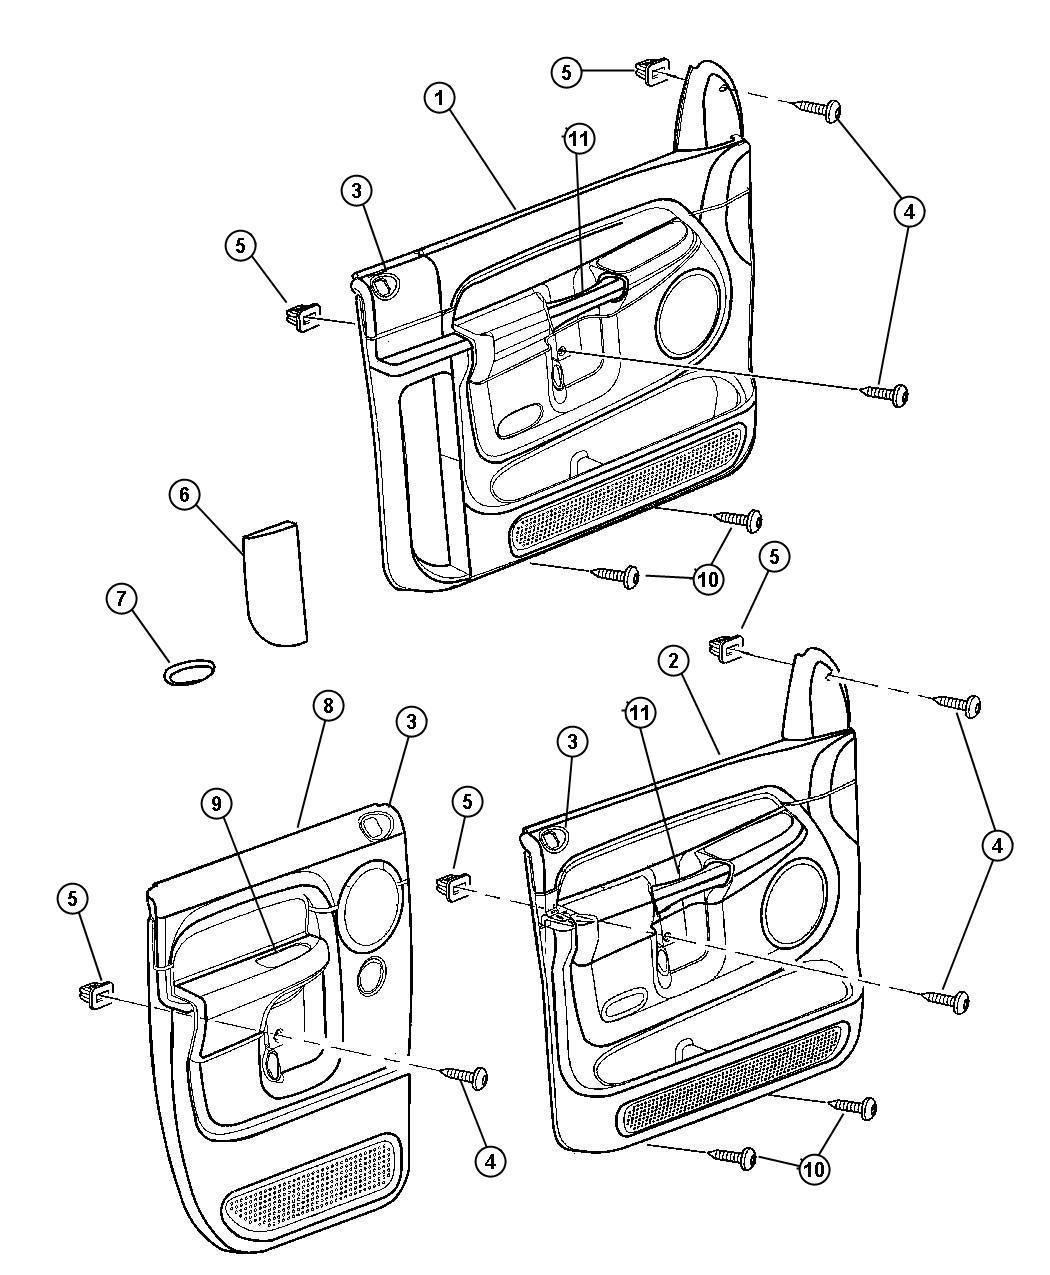 [DIAGRAM] Wiring Diagram For 2002 Dodge Ram 2500 FULL